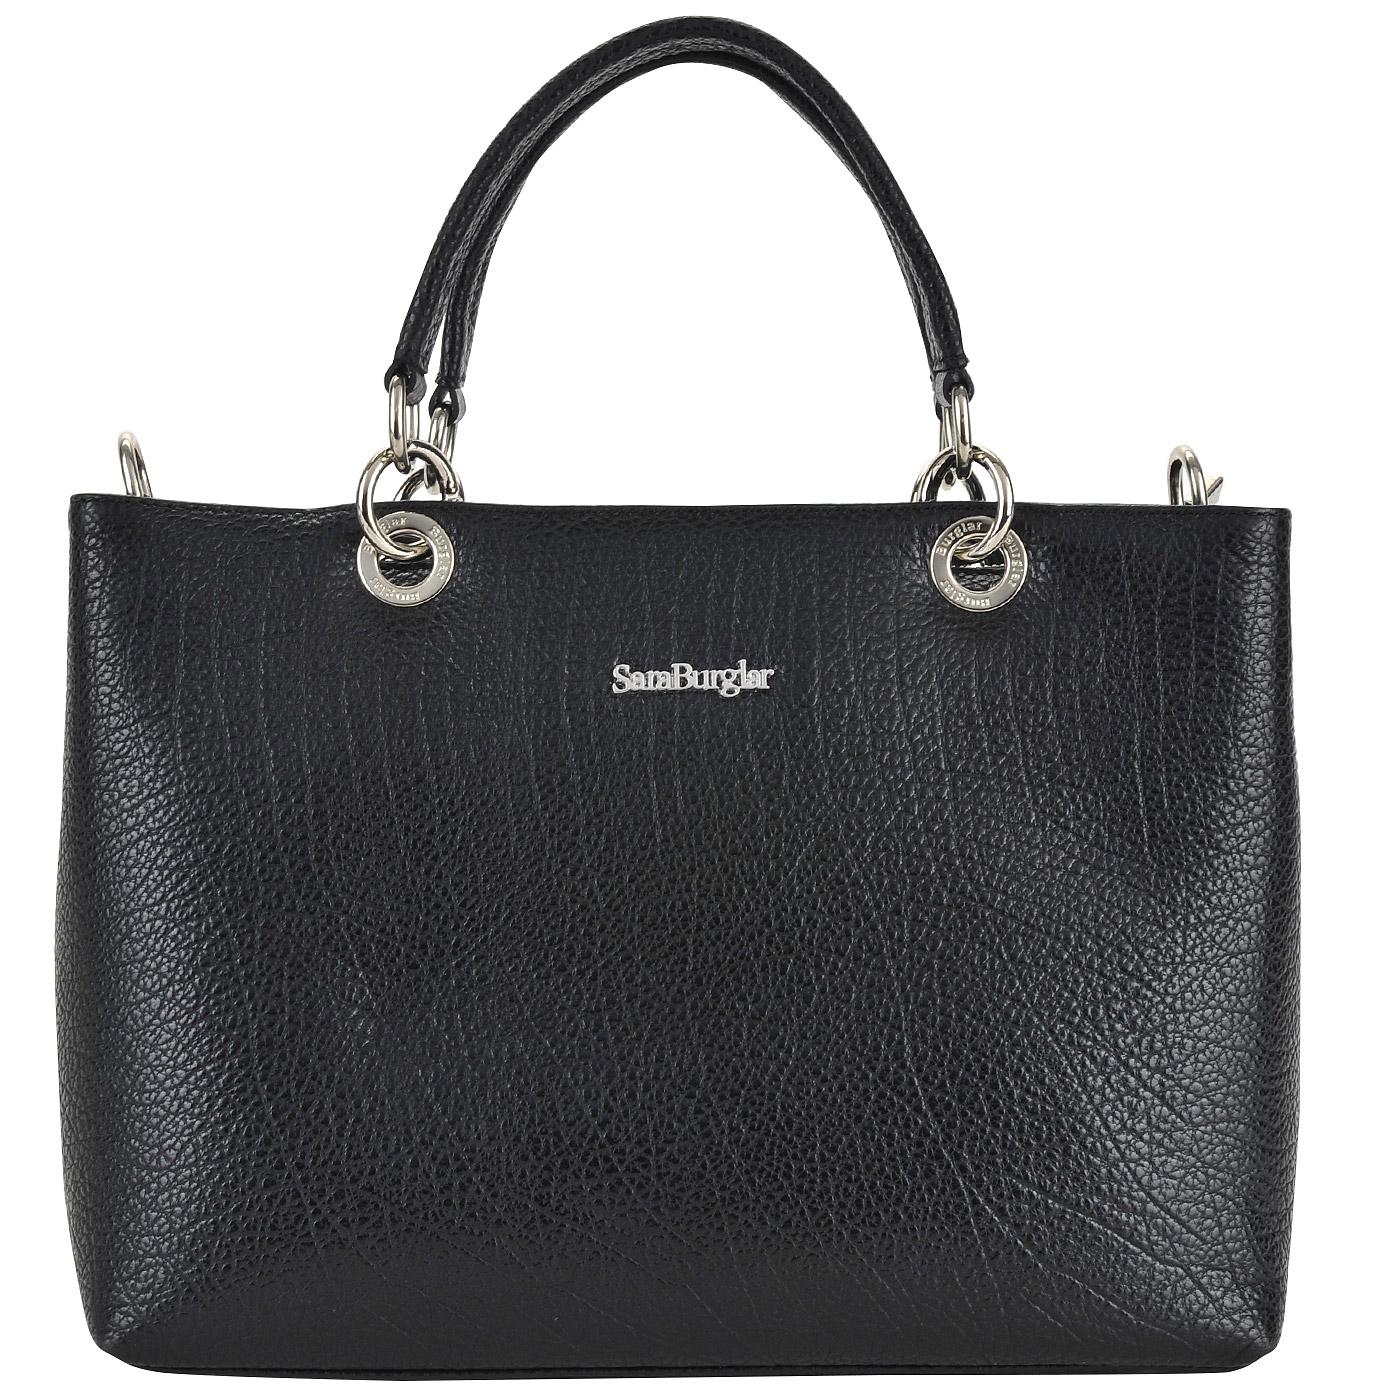 6cca3a9c1a87 ... Женская кожаная сумка с короткими ручками Sara Burglar New Cherie baby  ...